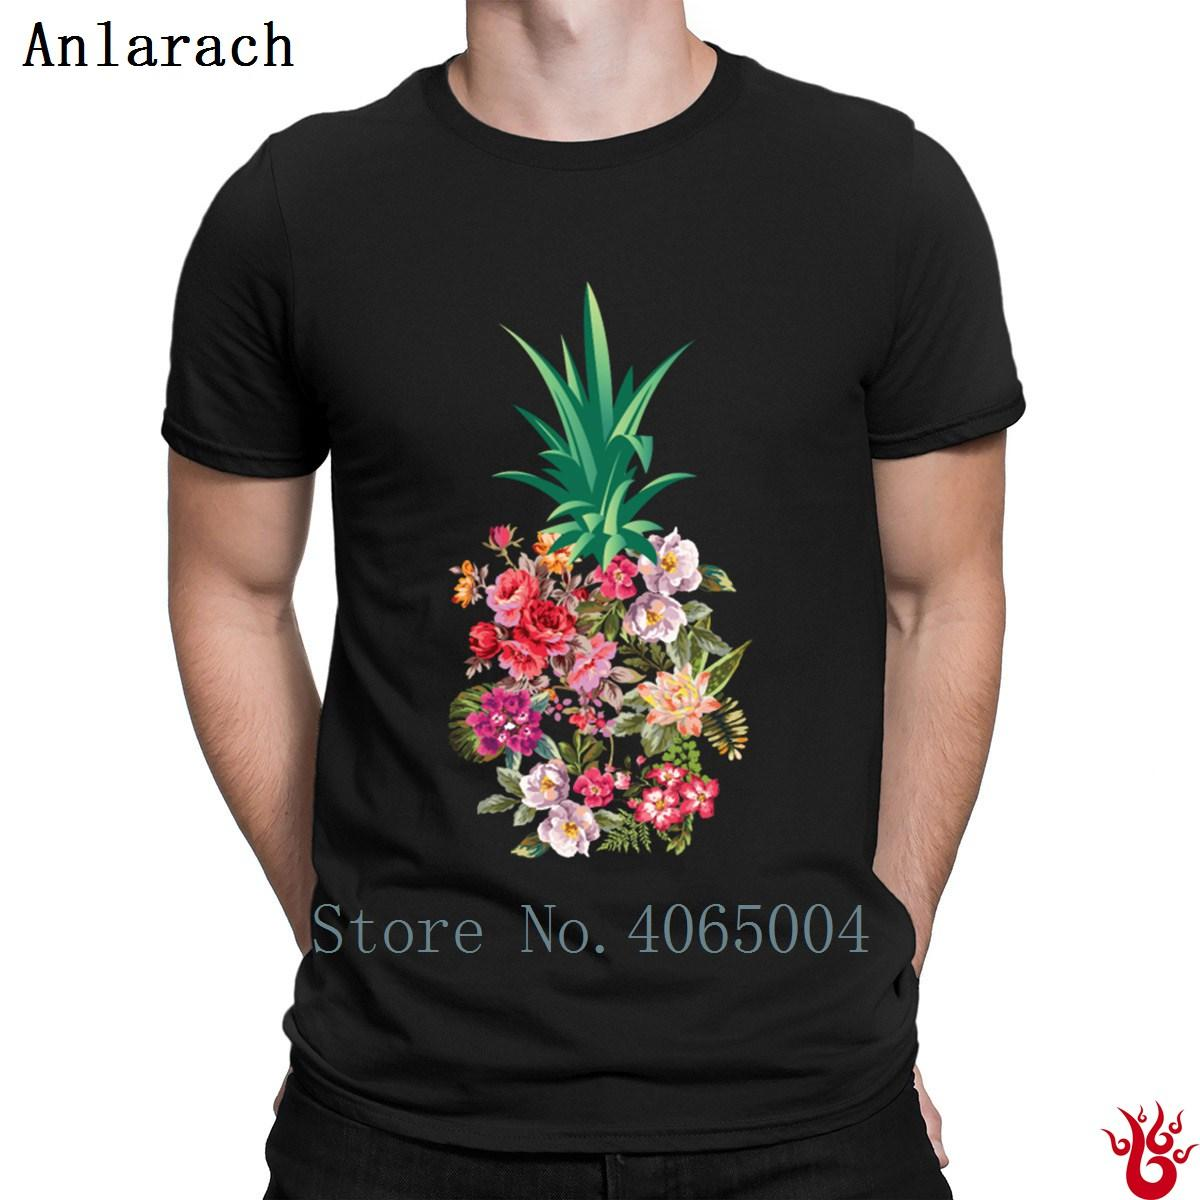 9ab6516a2e3a51 Pineapple Flowers Aloha Hawaii Vintage Hawaiian T Shirt Pop Top Tee  Authentic Men S Tshirt 2018 S Xxxl Fit Slim Original Coolest T Shirt Shirts  With Designs ...